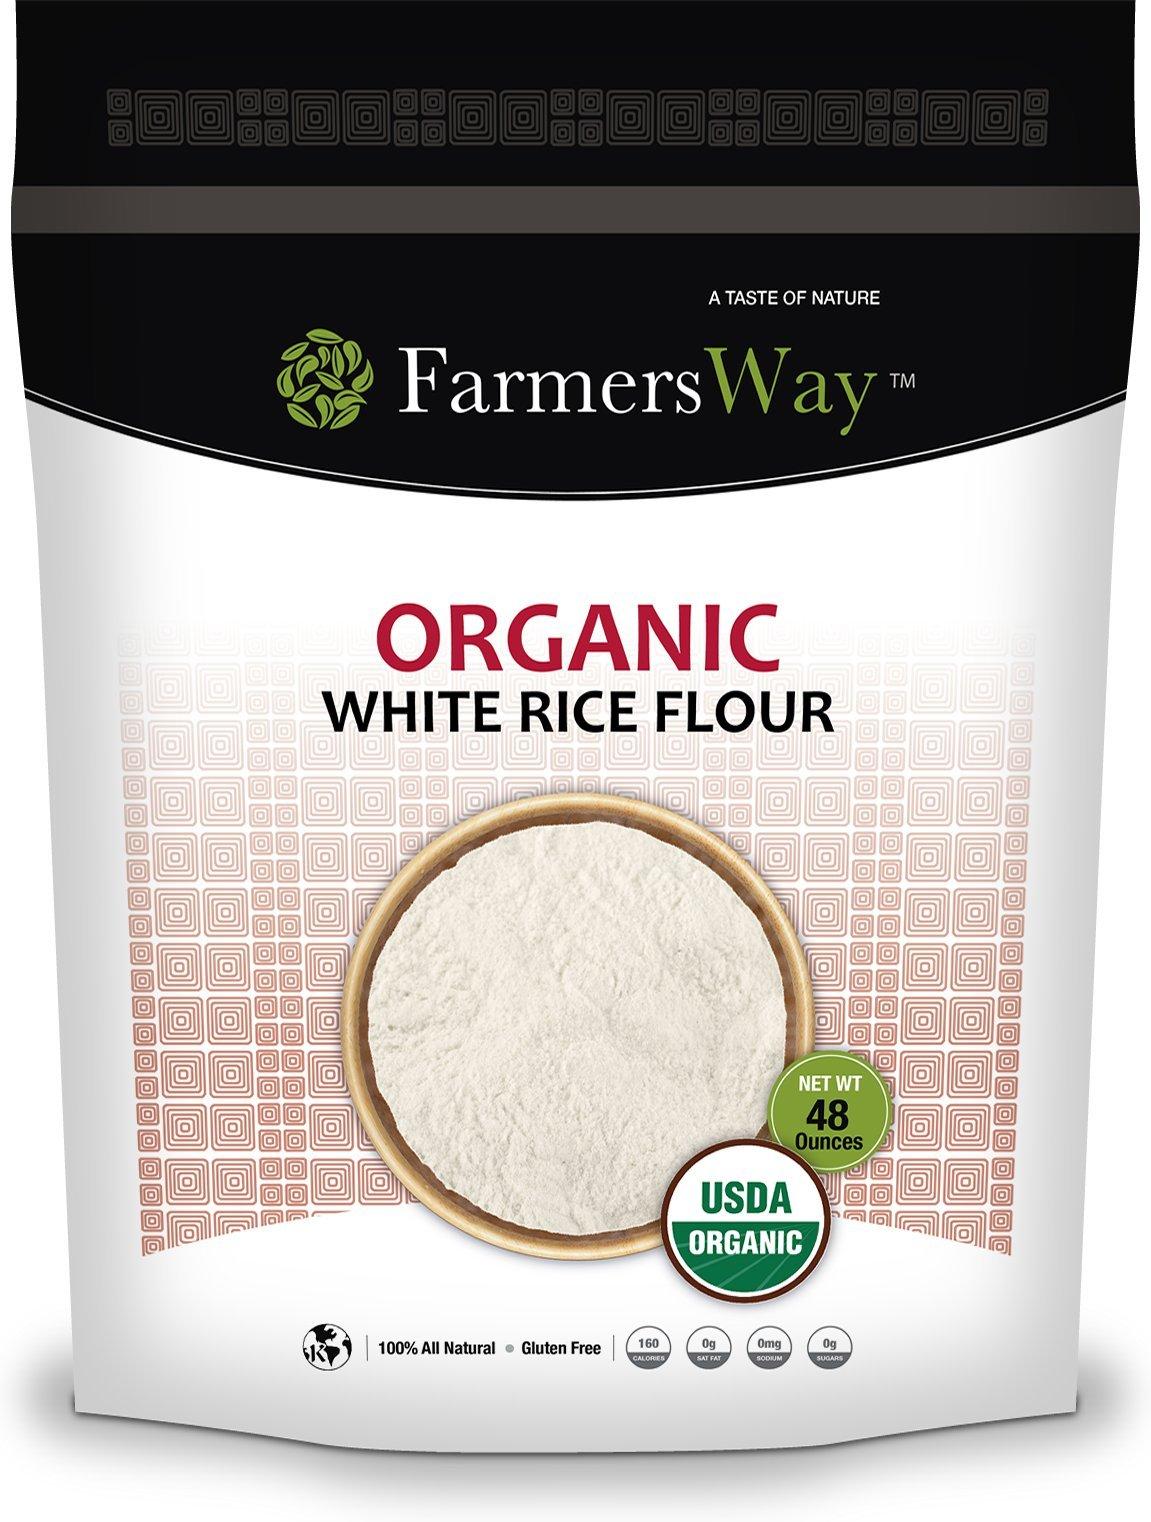 Farmers Way Organic White Rice Flour 100% Natural 48 Ounces